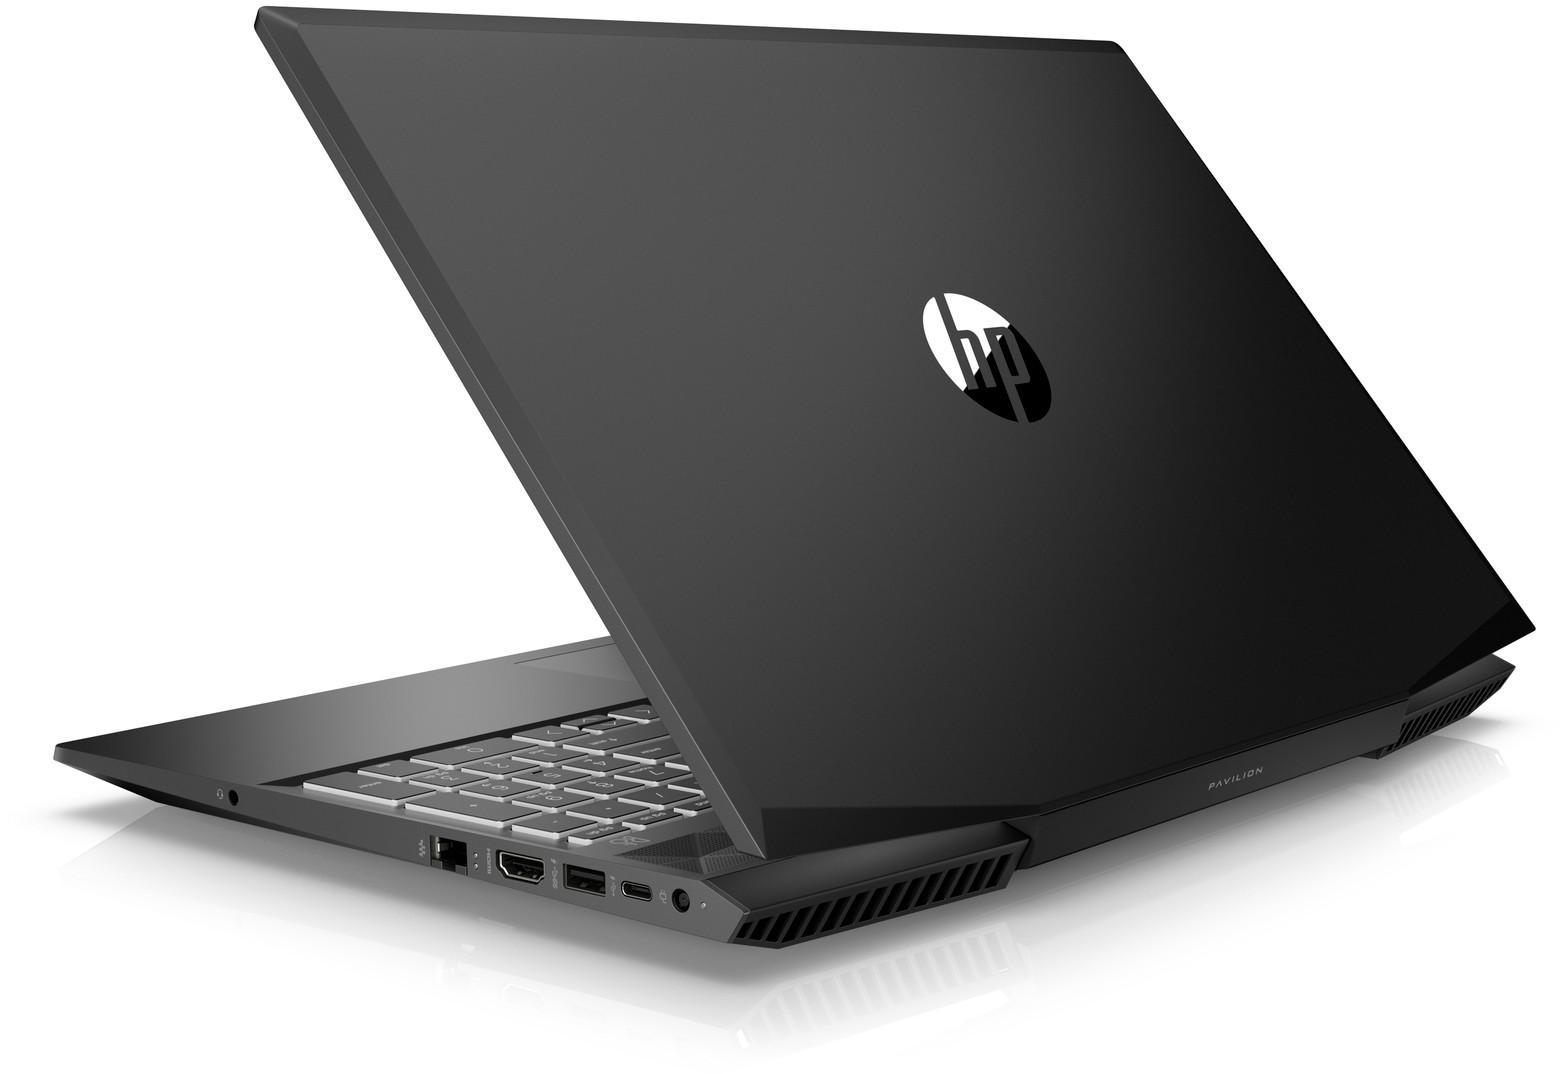 HP ProBook 650 G3 3JW80ESR HP Renew